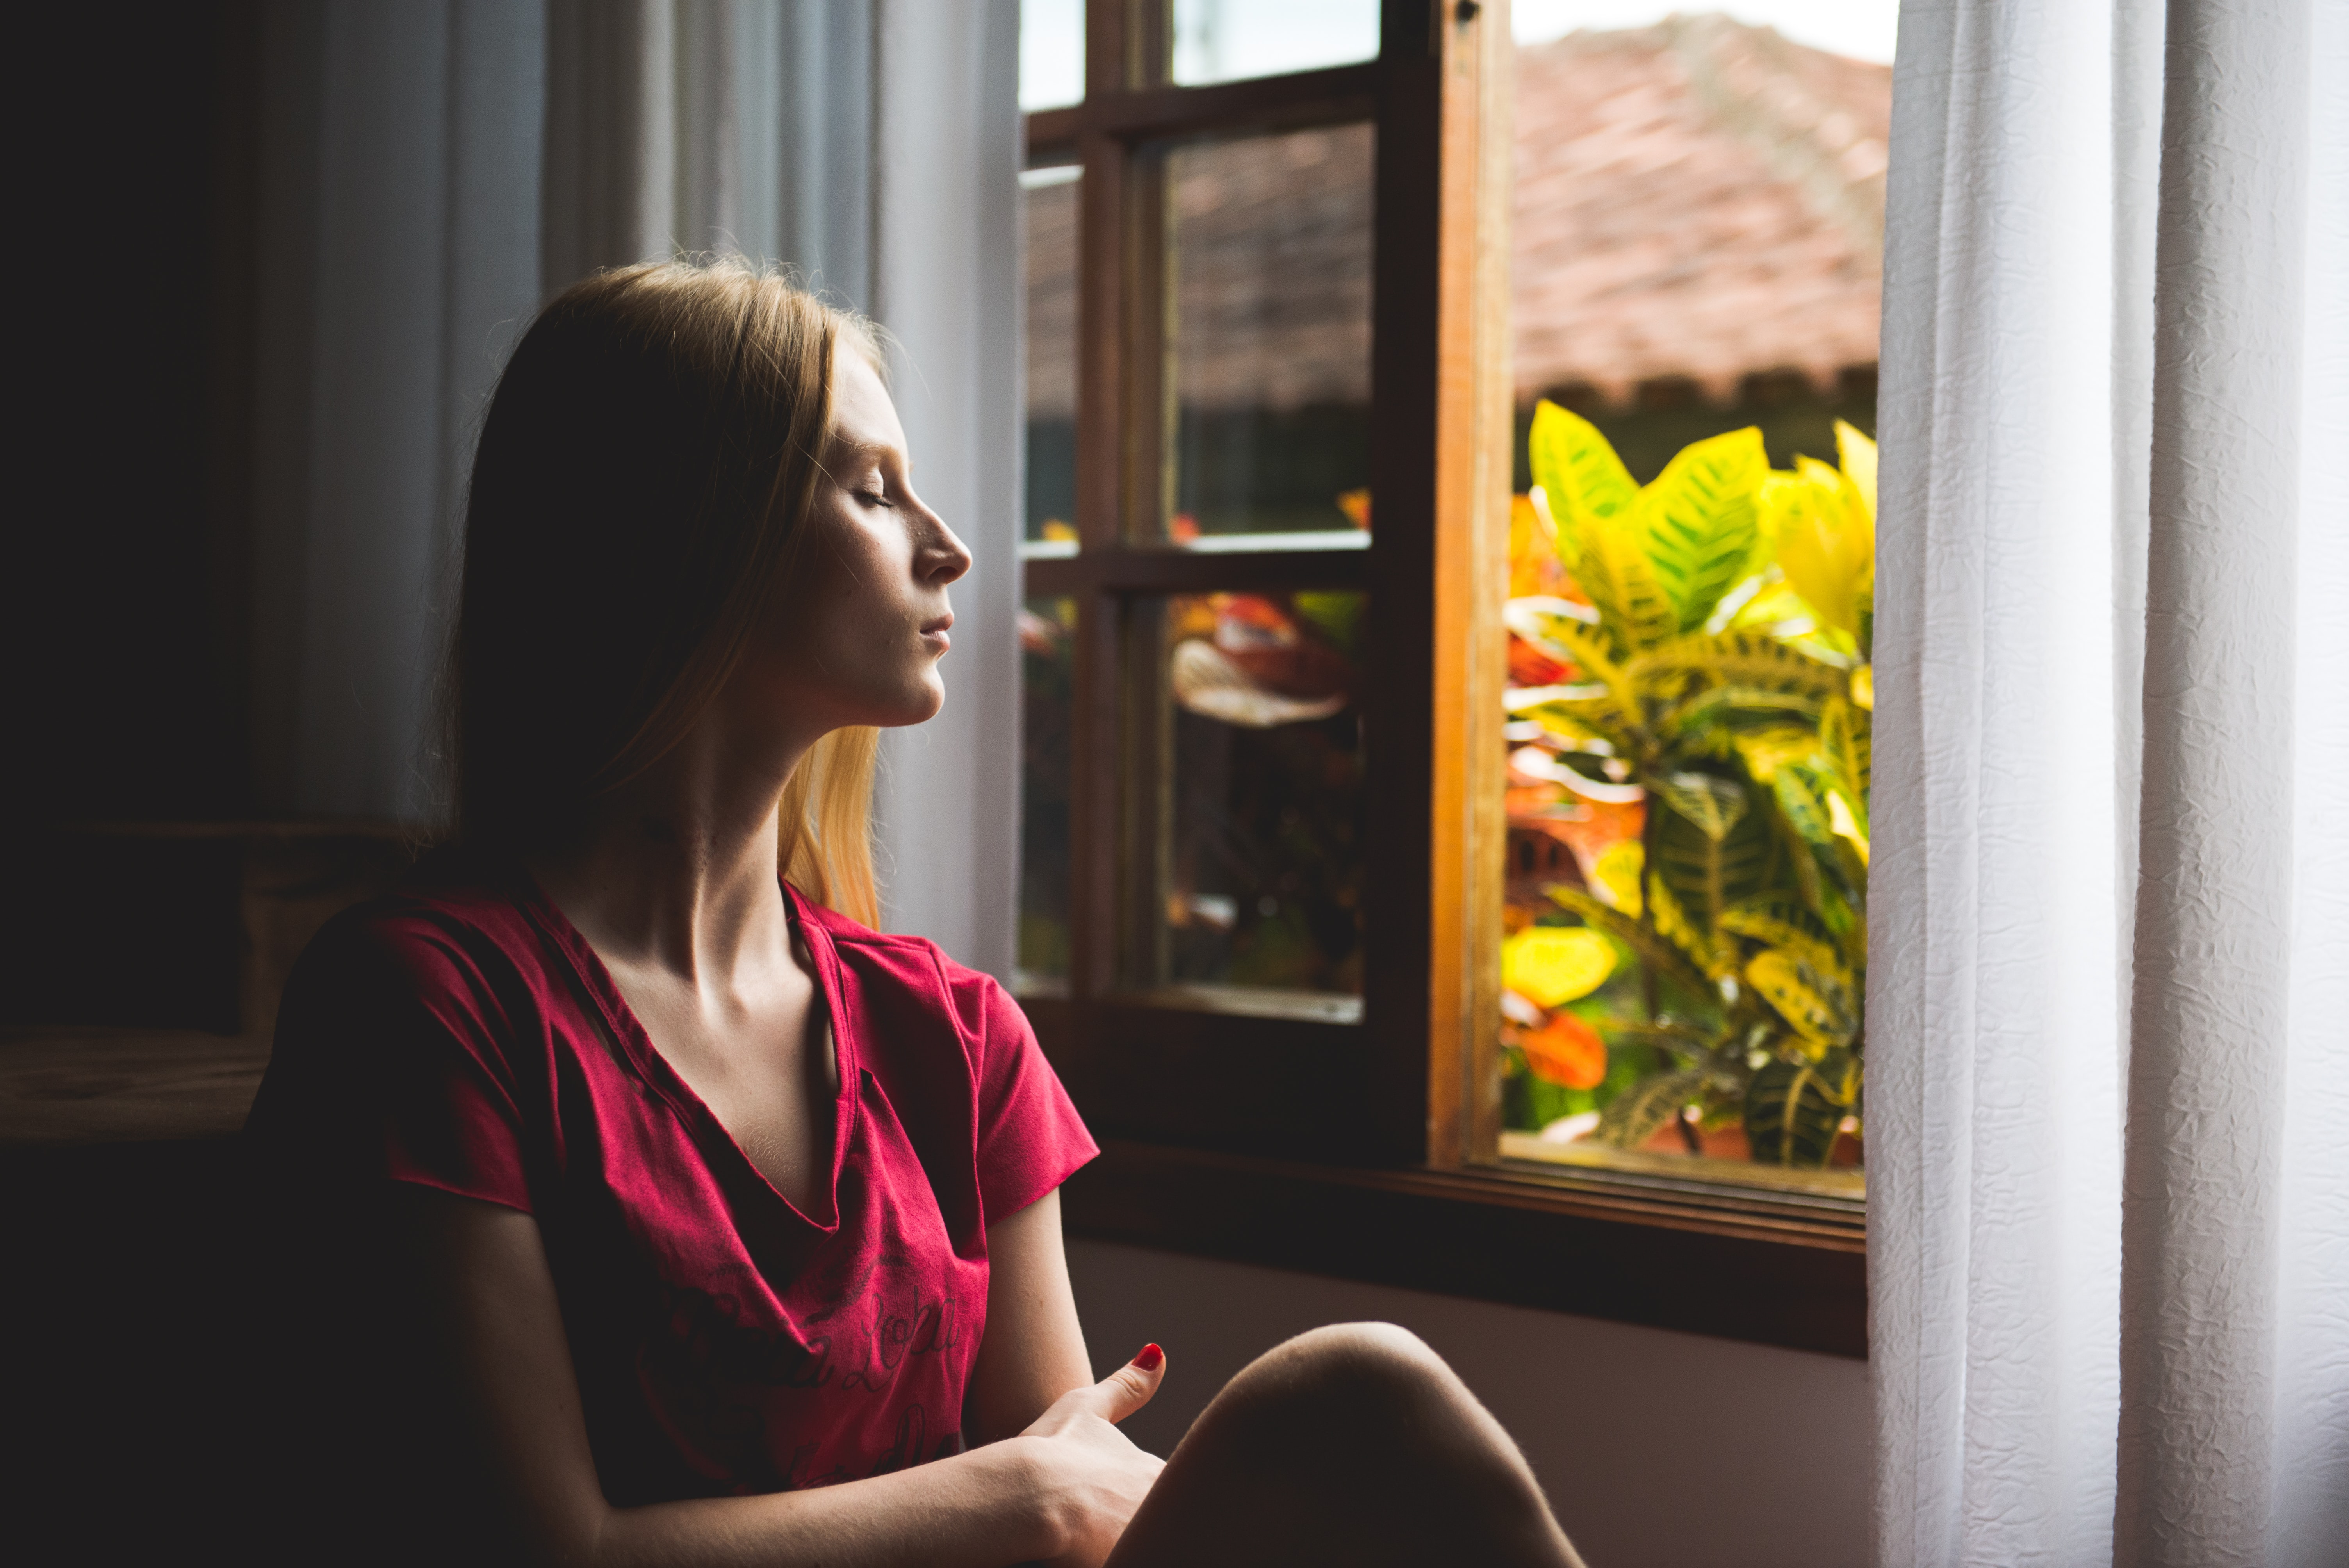 woman sitting near window looking out